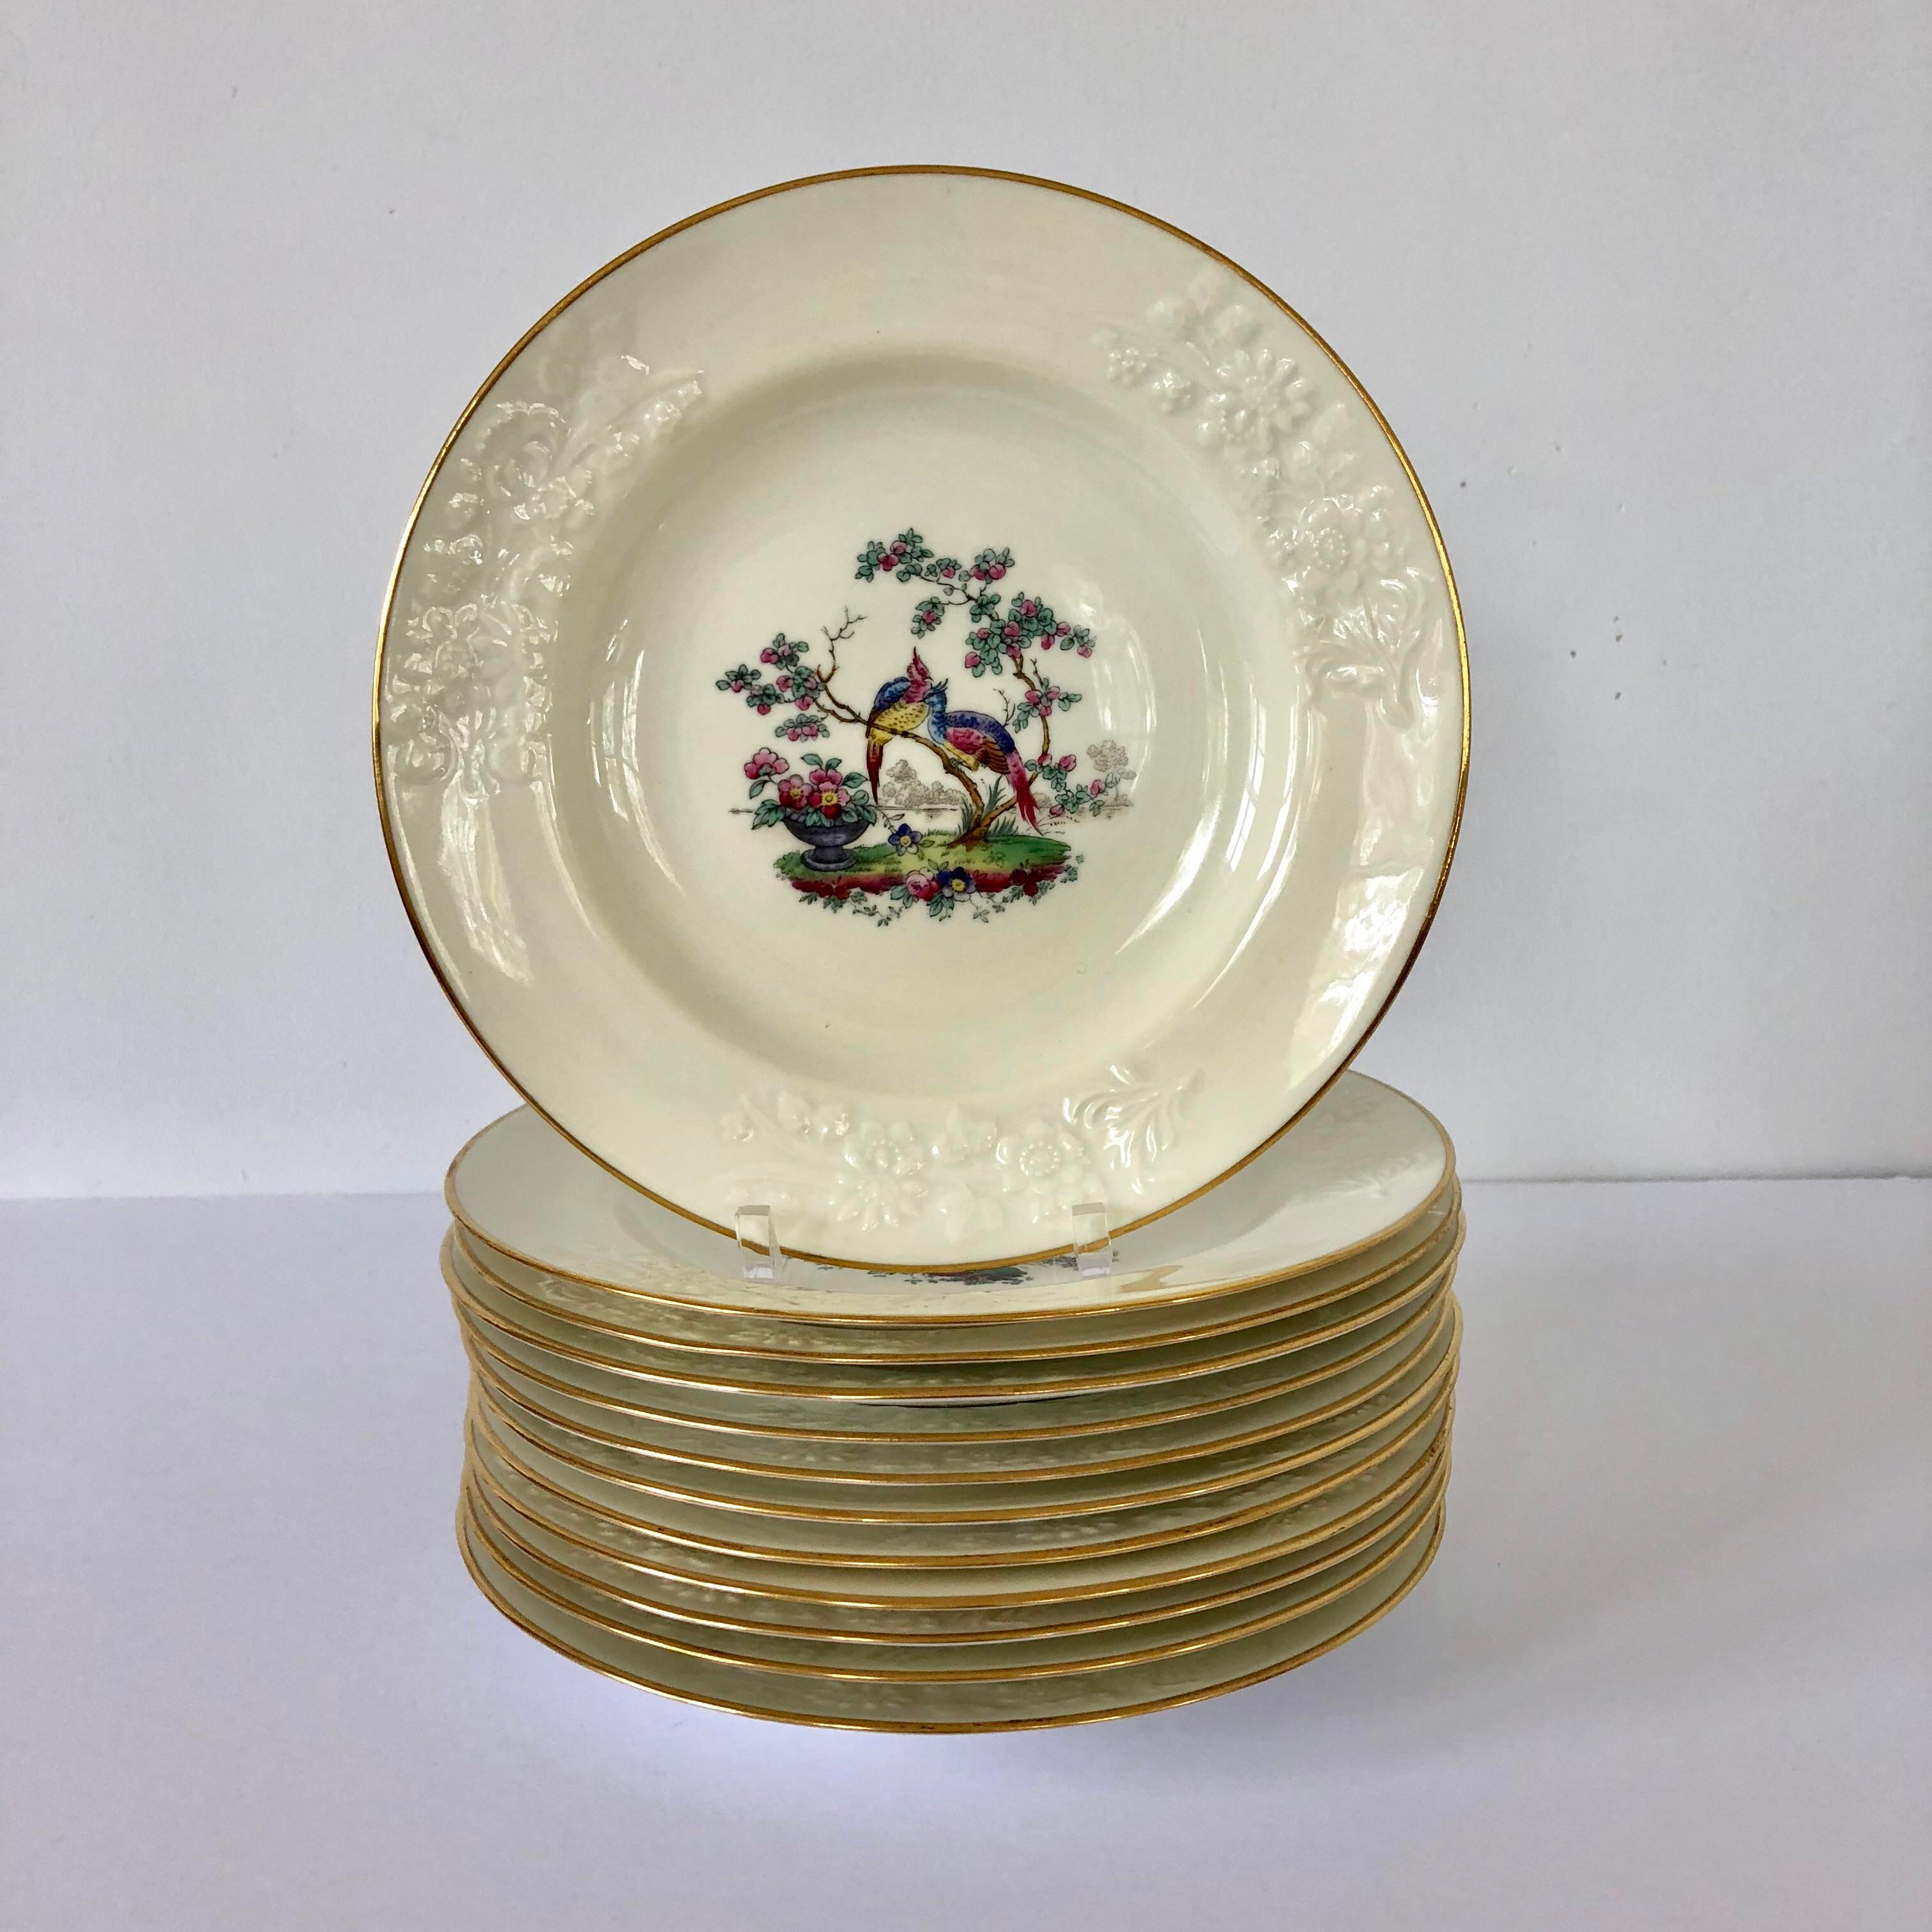 Tiffany u0026 Co. Plates - Set of 12 - Image 7 ... & Tiffany u0026 Co. Plates - Set of 12 | Chairish